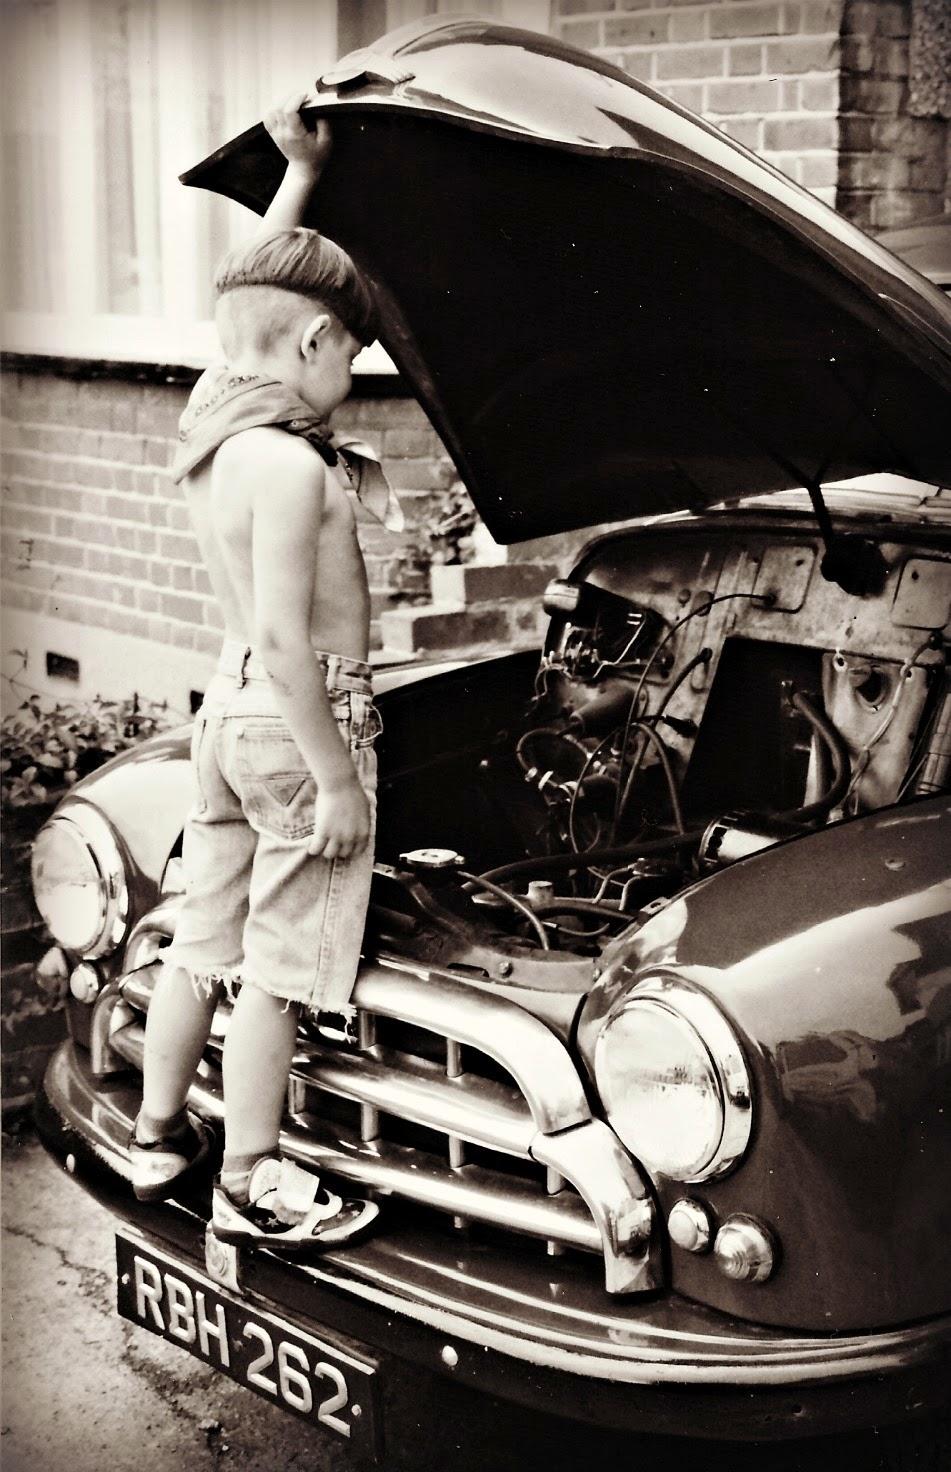 Morris Oxford, mechanic, arty